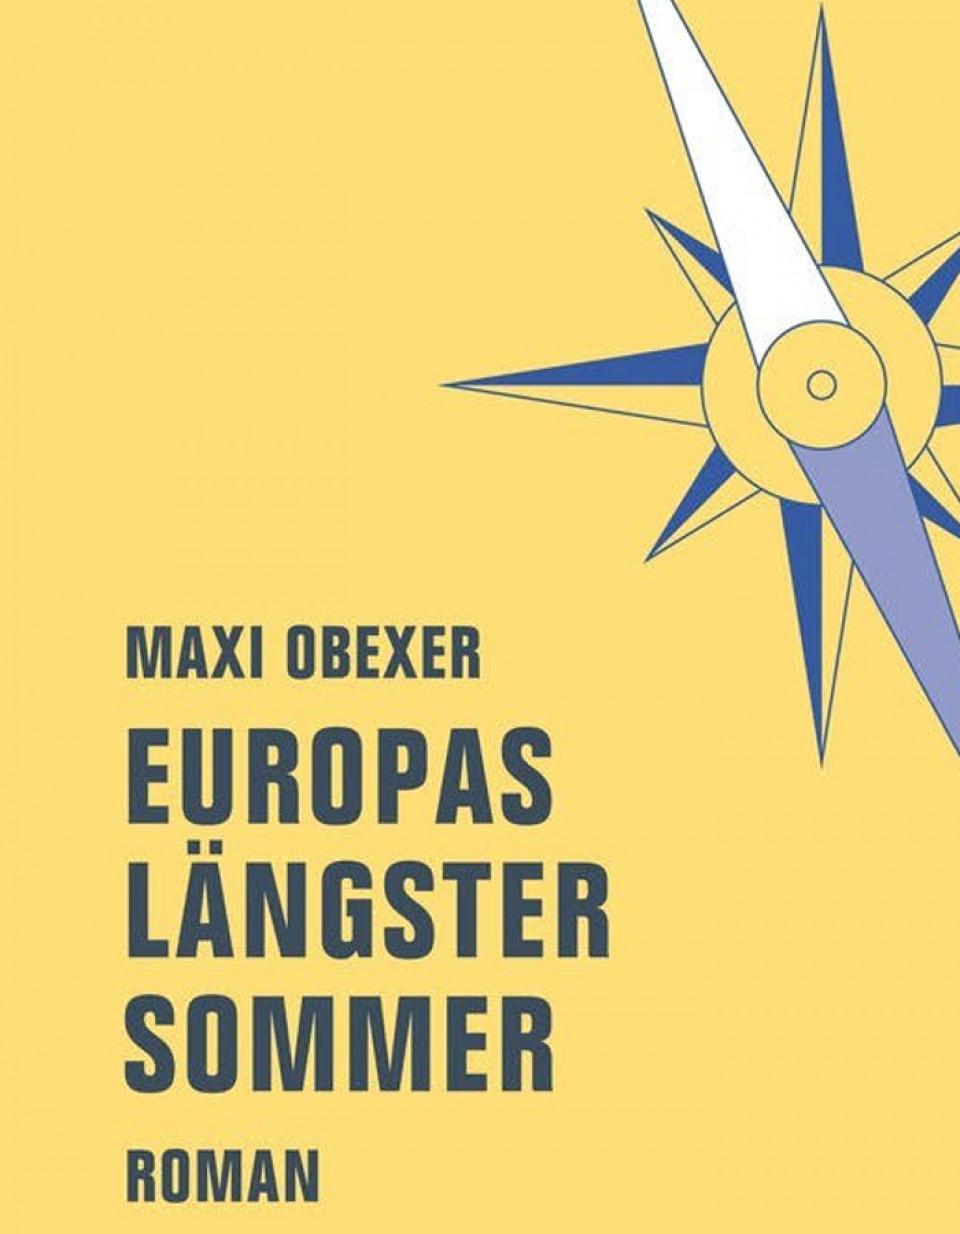 maxi_obexer_text.jpg